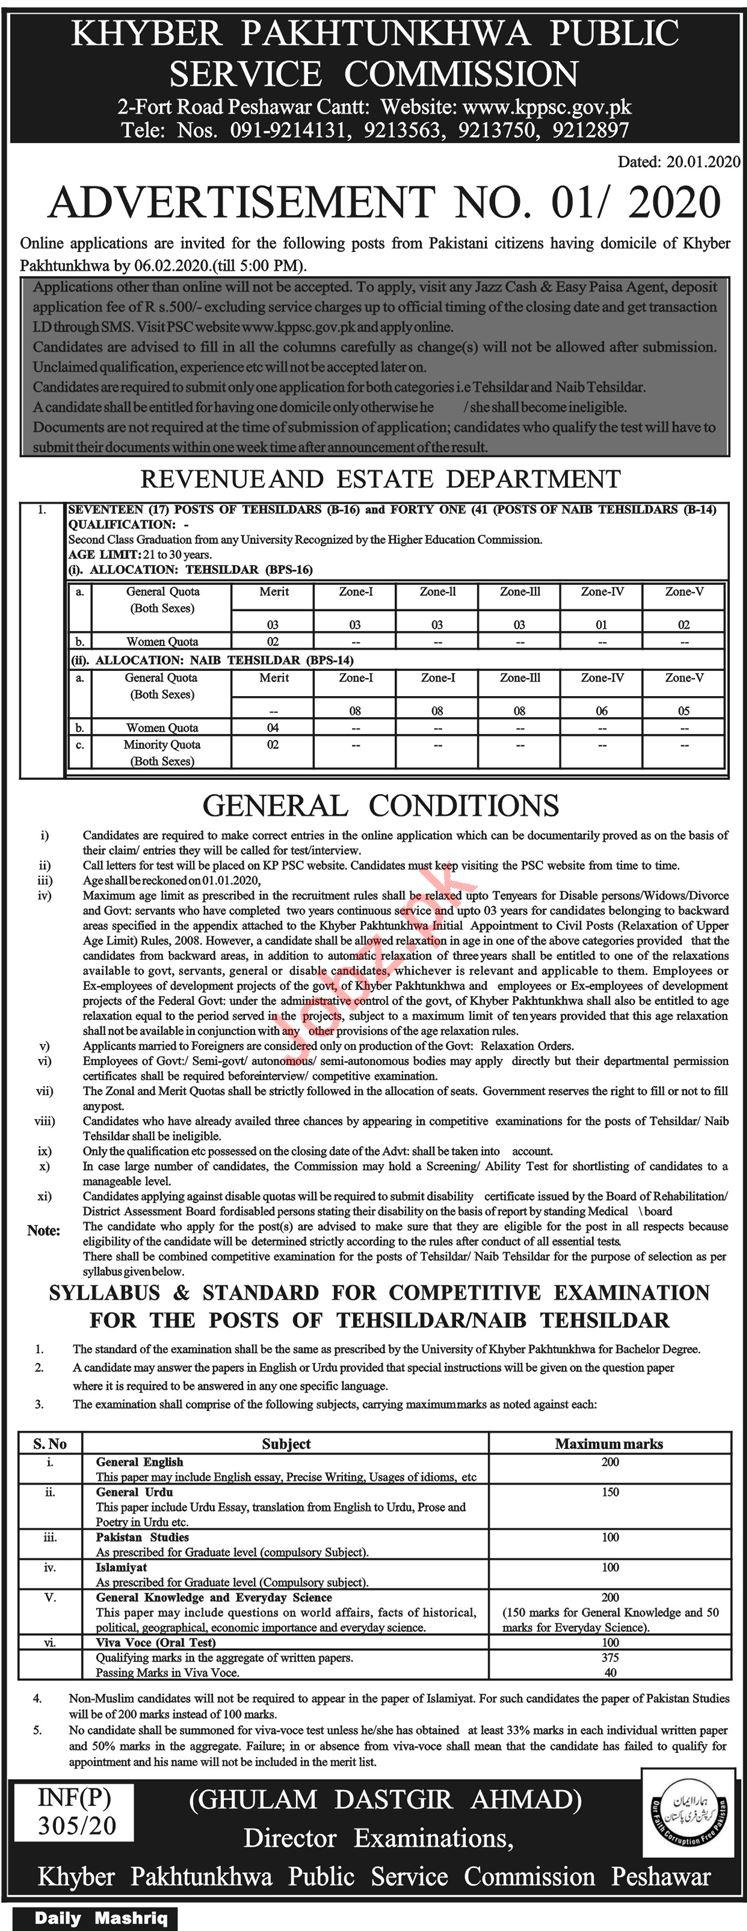 Khyber Pakhtunkhwa Public Service Commission KPPSC Jobs 2020